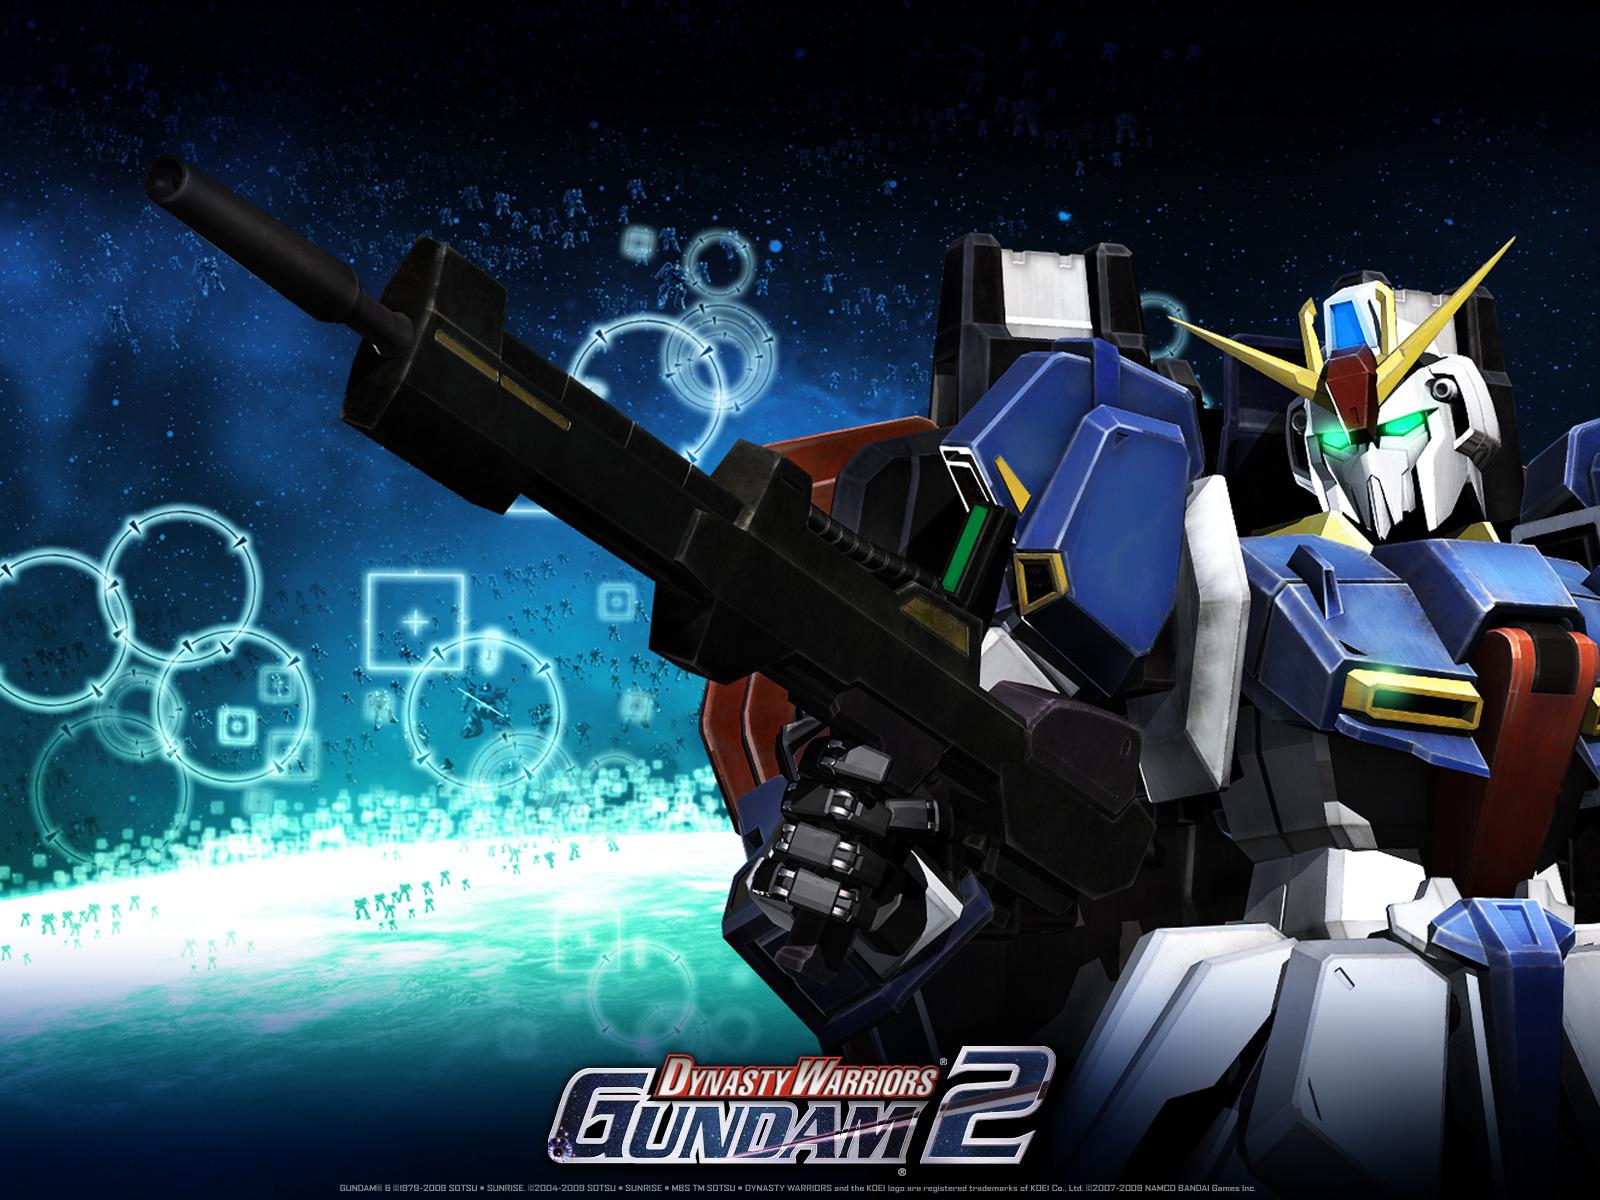 Gundam  Dynasty Warriors Gundam 2 Wallpaper Gallery   Best 1600x1200